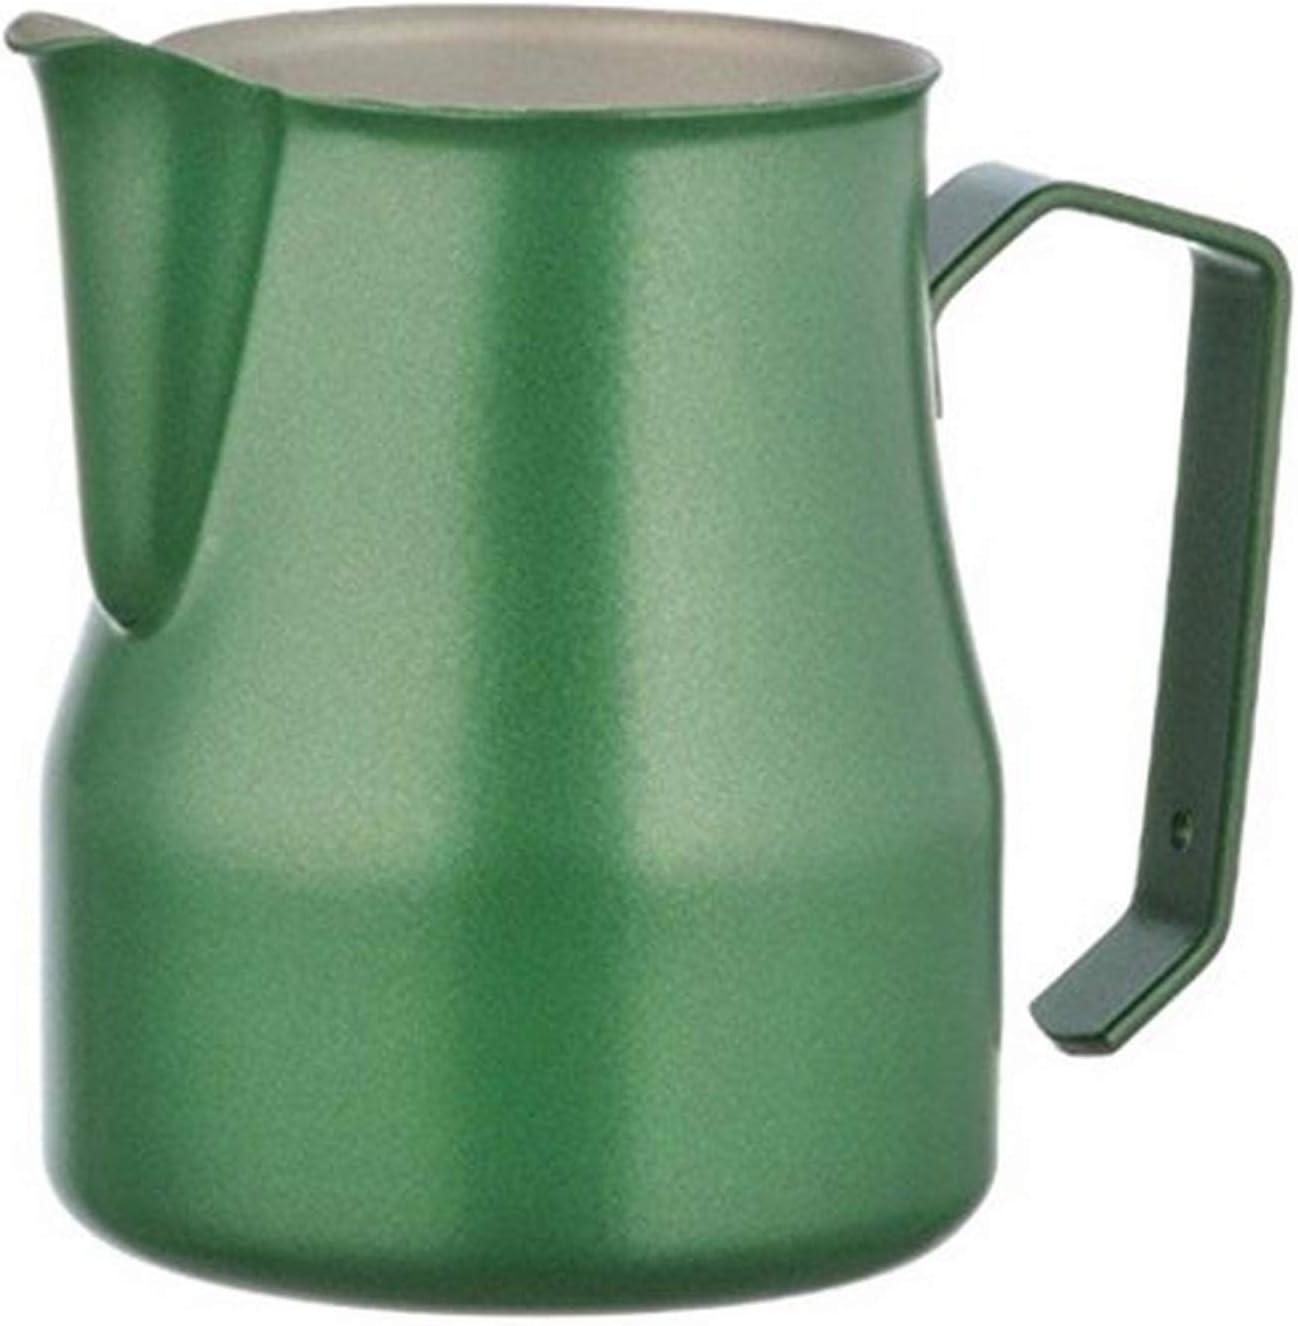 17 Fl Metallurgica Motta 8007986028501 Motta Stainless Steel Professional Milk Pitcher Oz Green One size